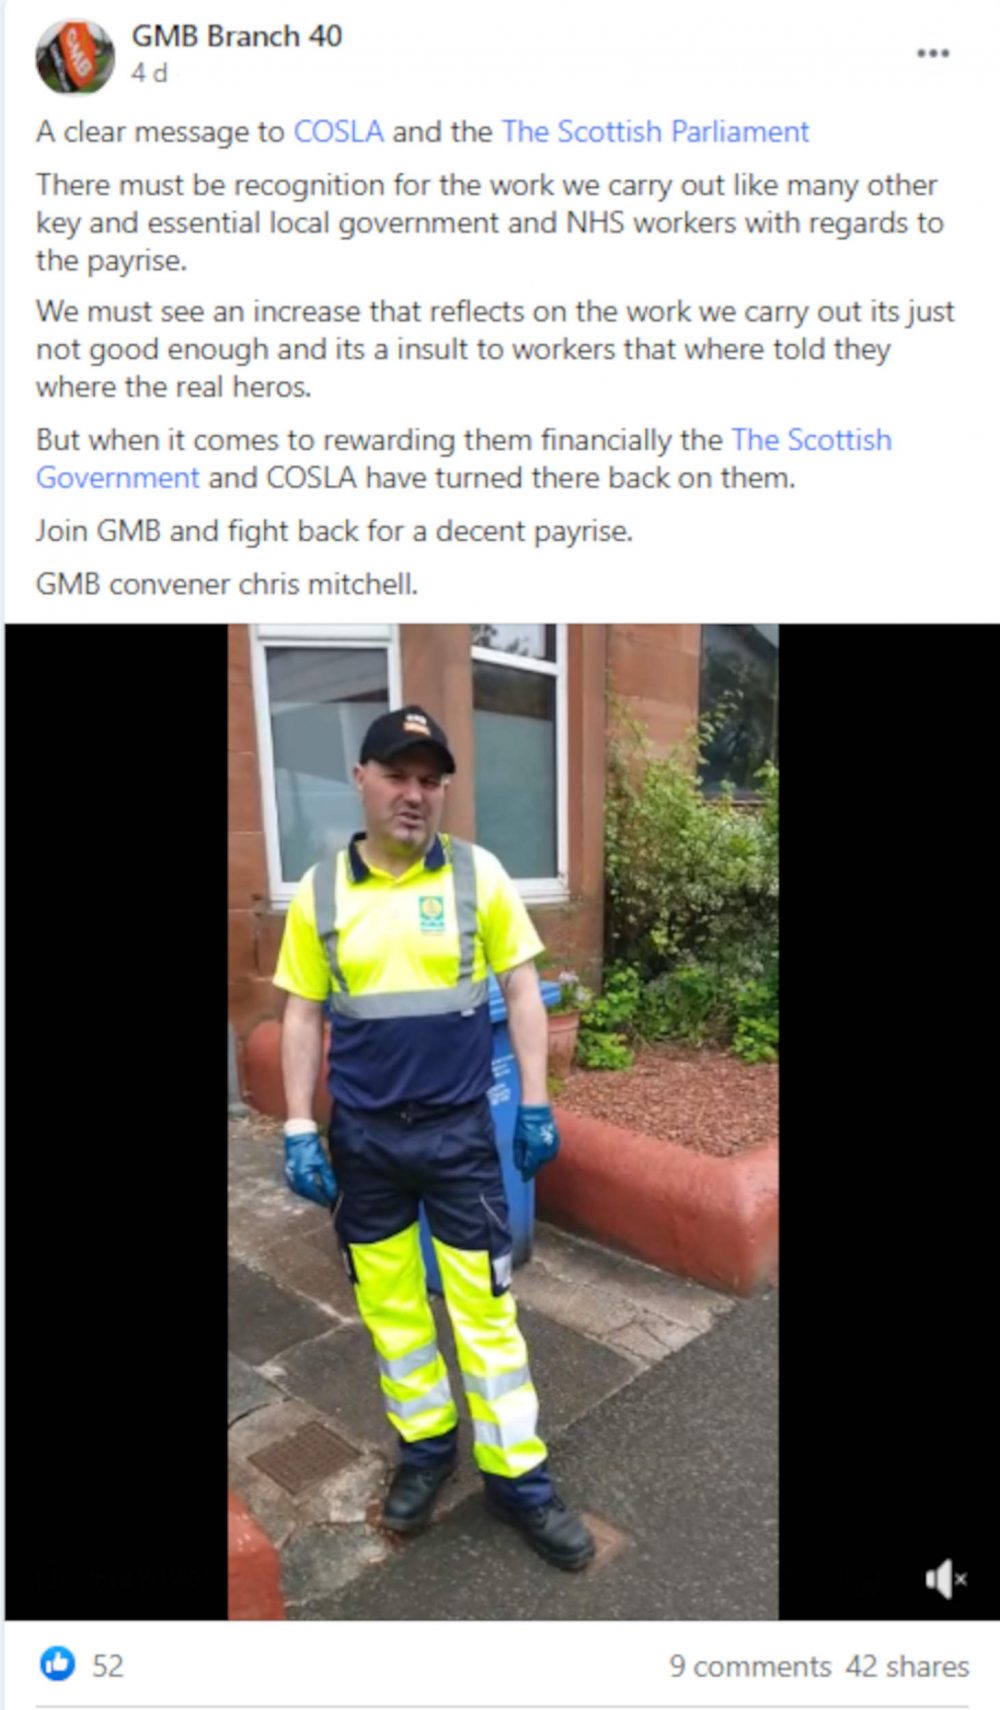 GMB Branch 40 bins post - Scottish News